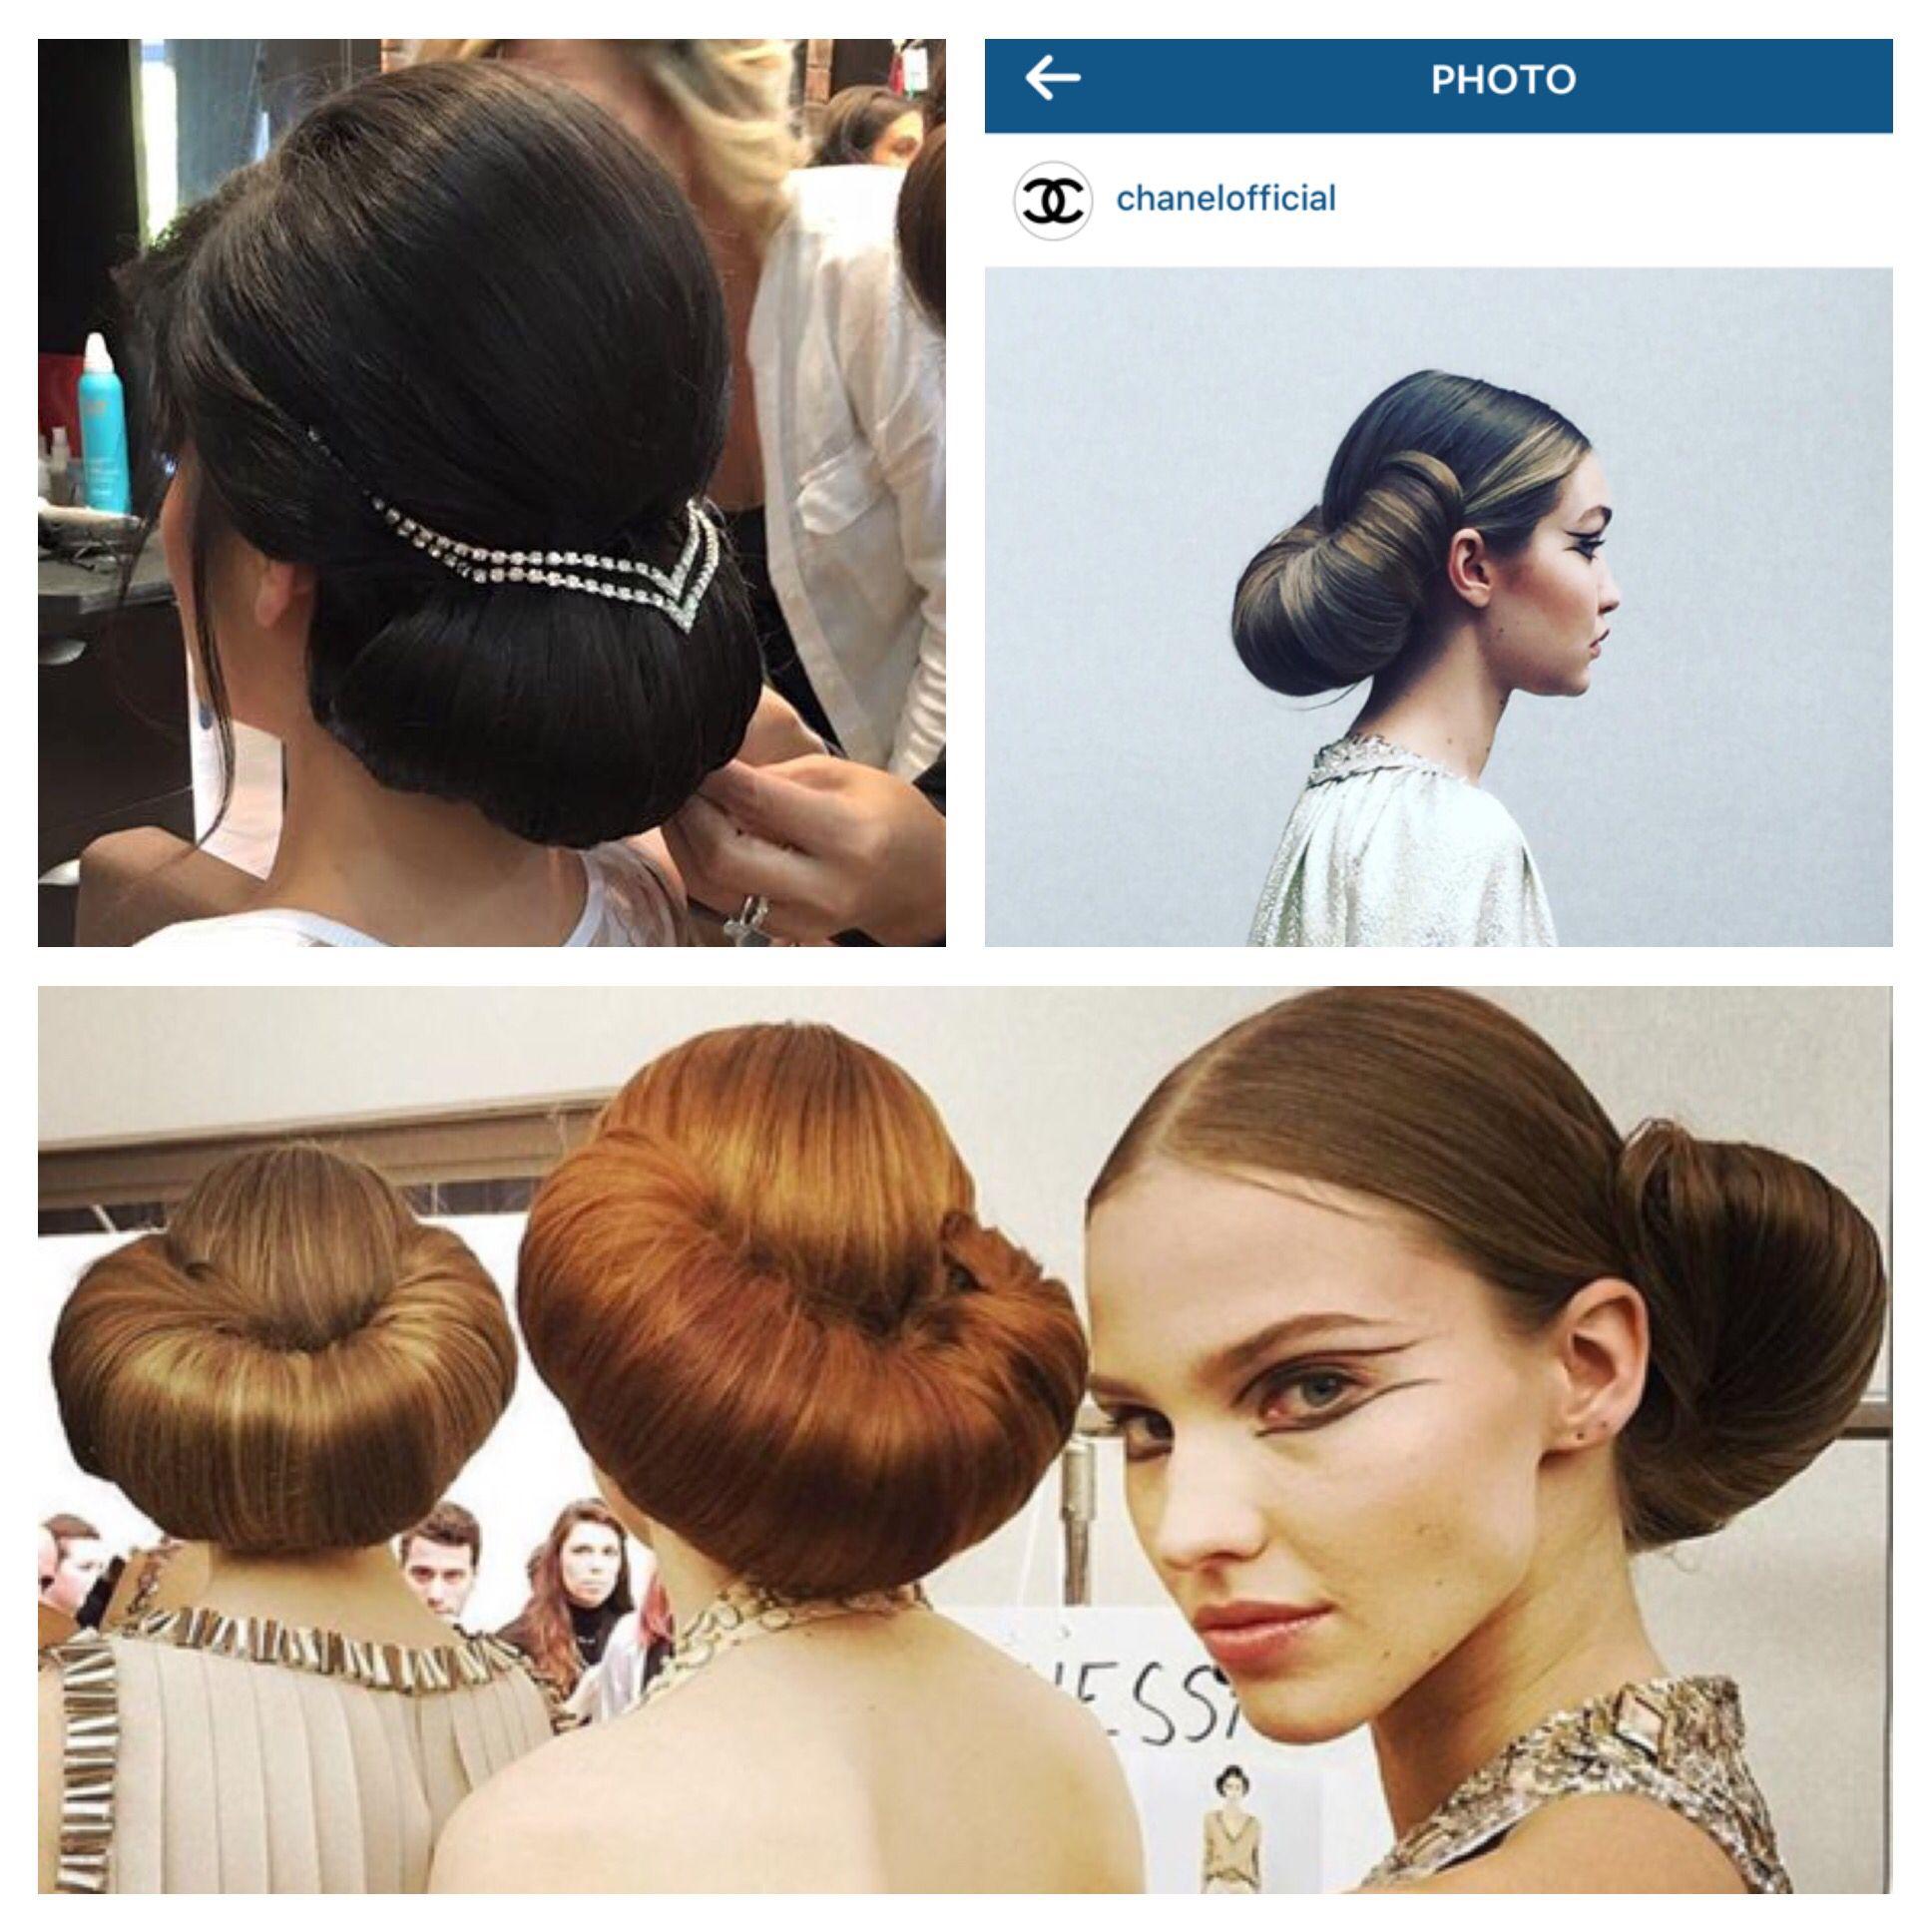 Chanel runway 2016 hair was so similar my wedding updo  #highfashion ;)